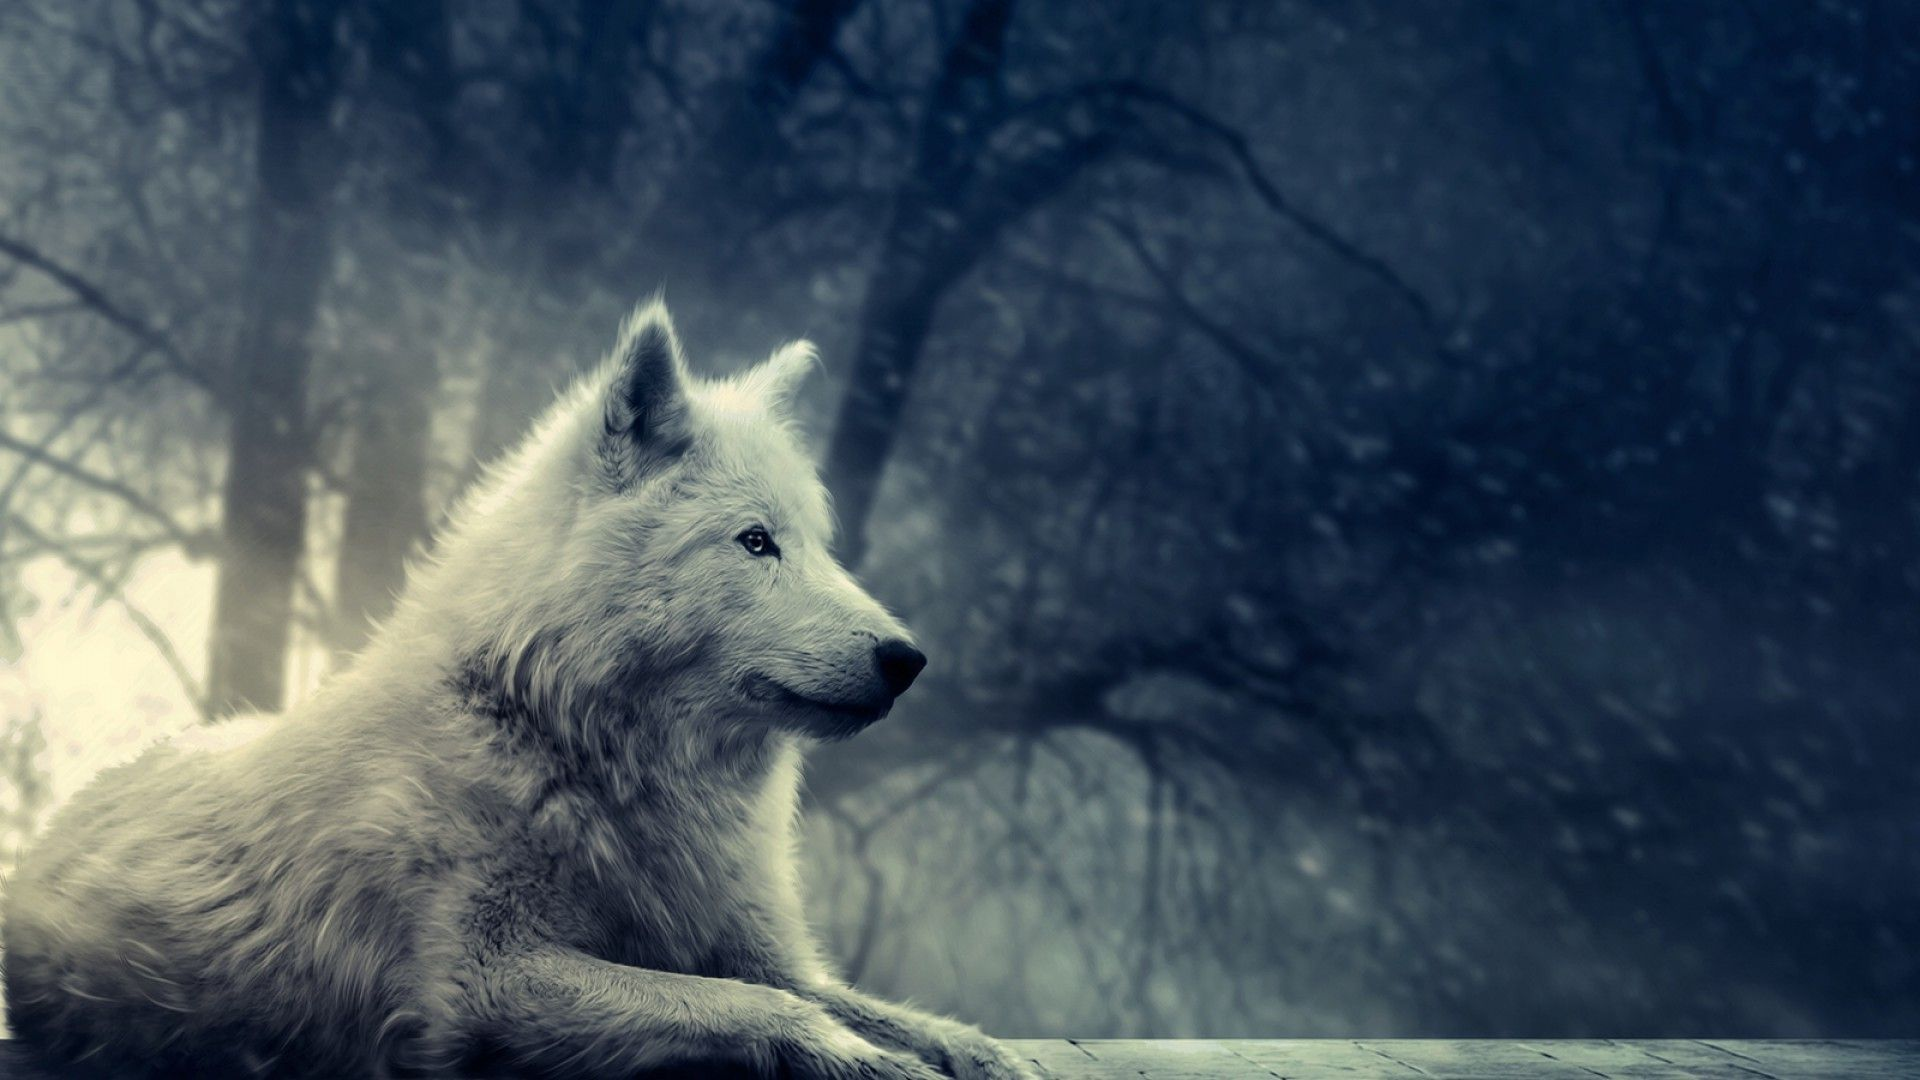 64k Ultra Hd Wolf Wallpapers Top Free 64k Ultra Hd Wolf Backgrounds Wallpaperaccess